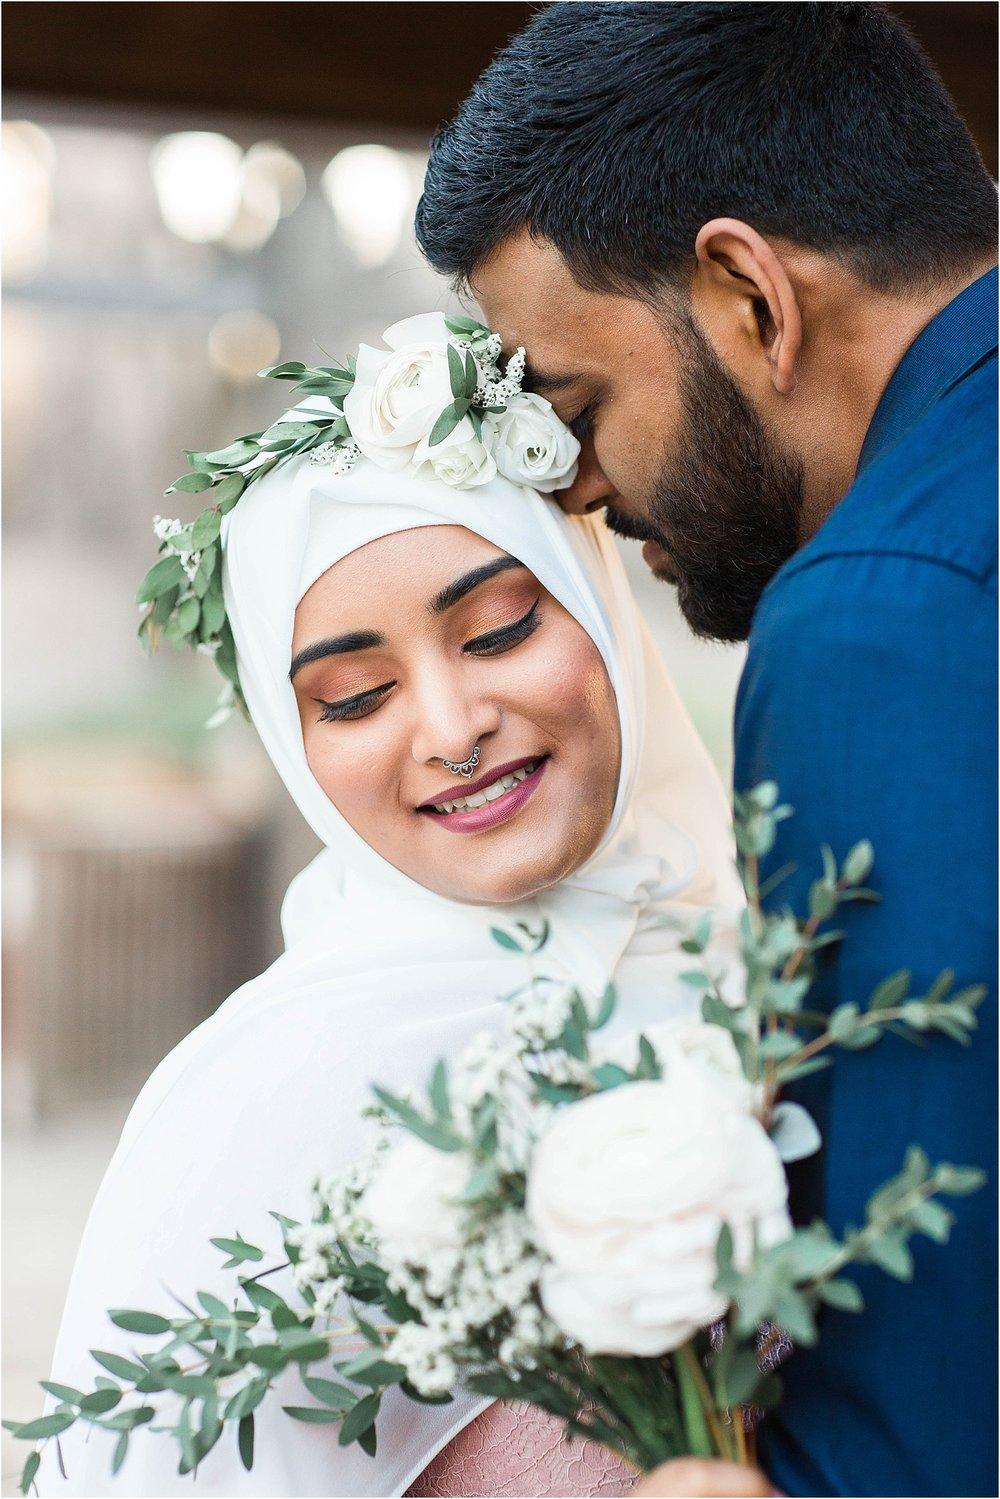 Kariya-Park-Anniversary-Session-Toronto-Mississauga-Brampton-Scarborough-GTA-Pakistani-Indian-Wedding-Engagement-Photographer-Photography_0036.jpg